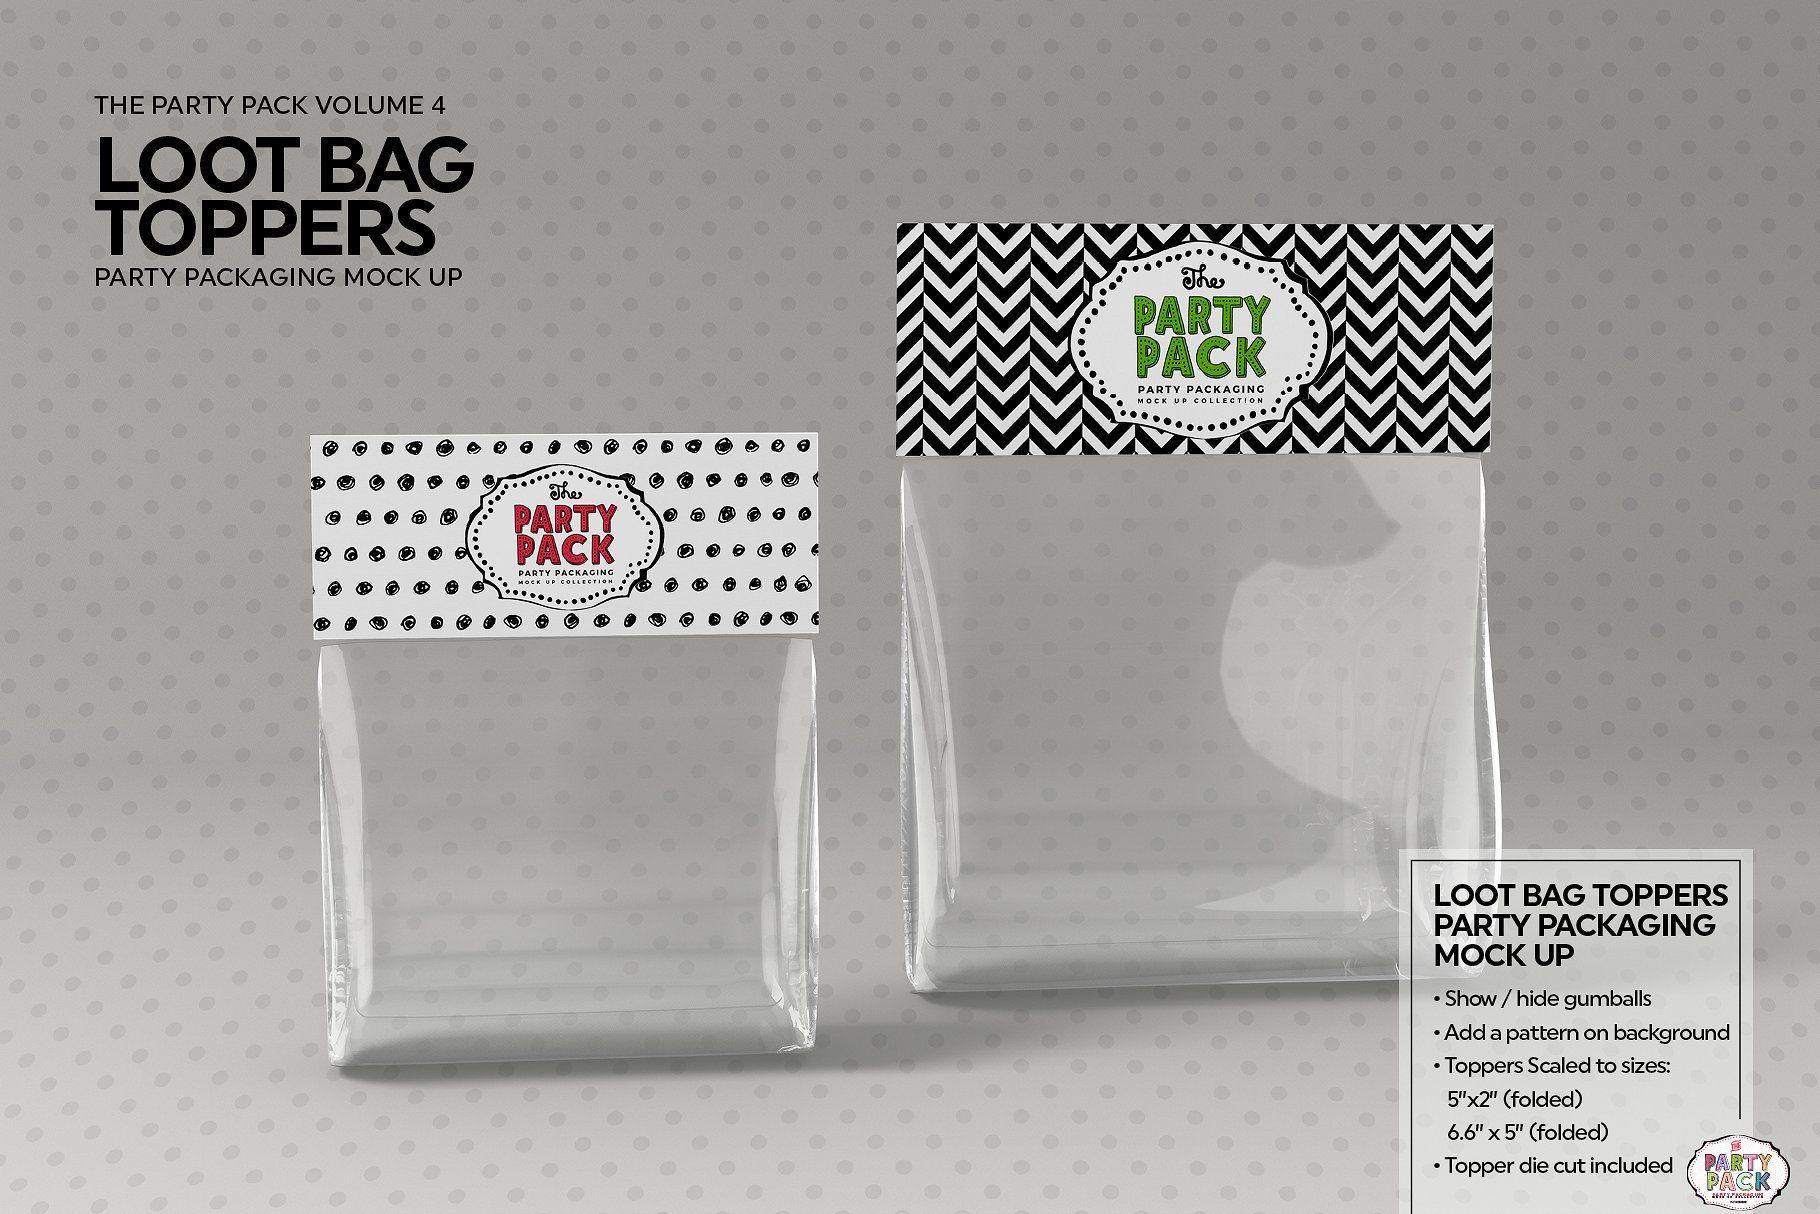 Download Loot Bag Topper Packaging Mockup Loot Bags Bag Topper Party Packs